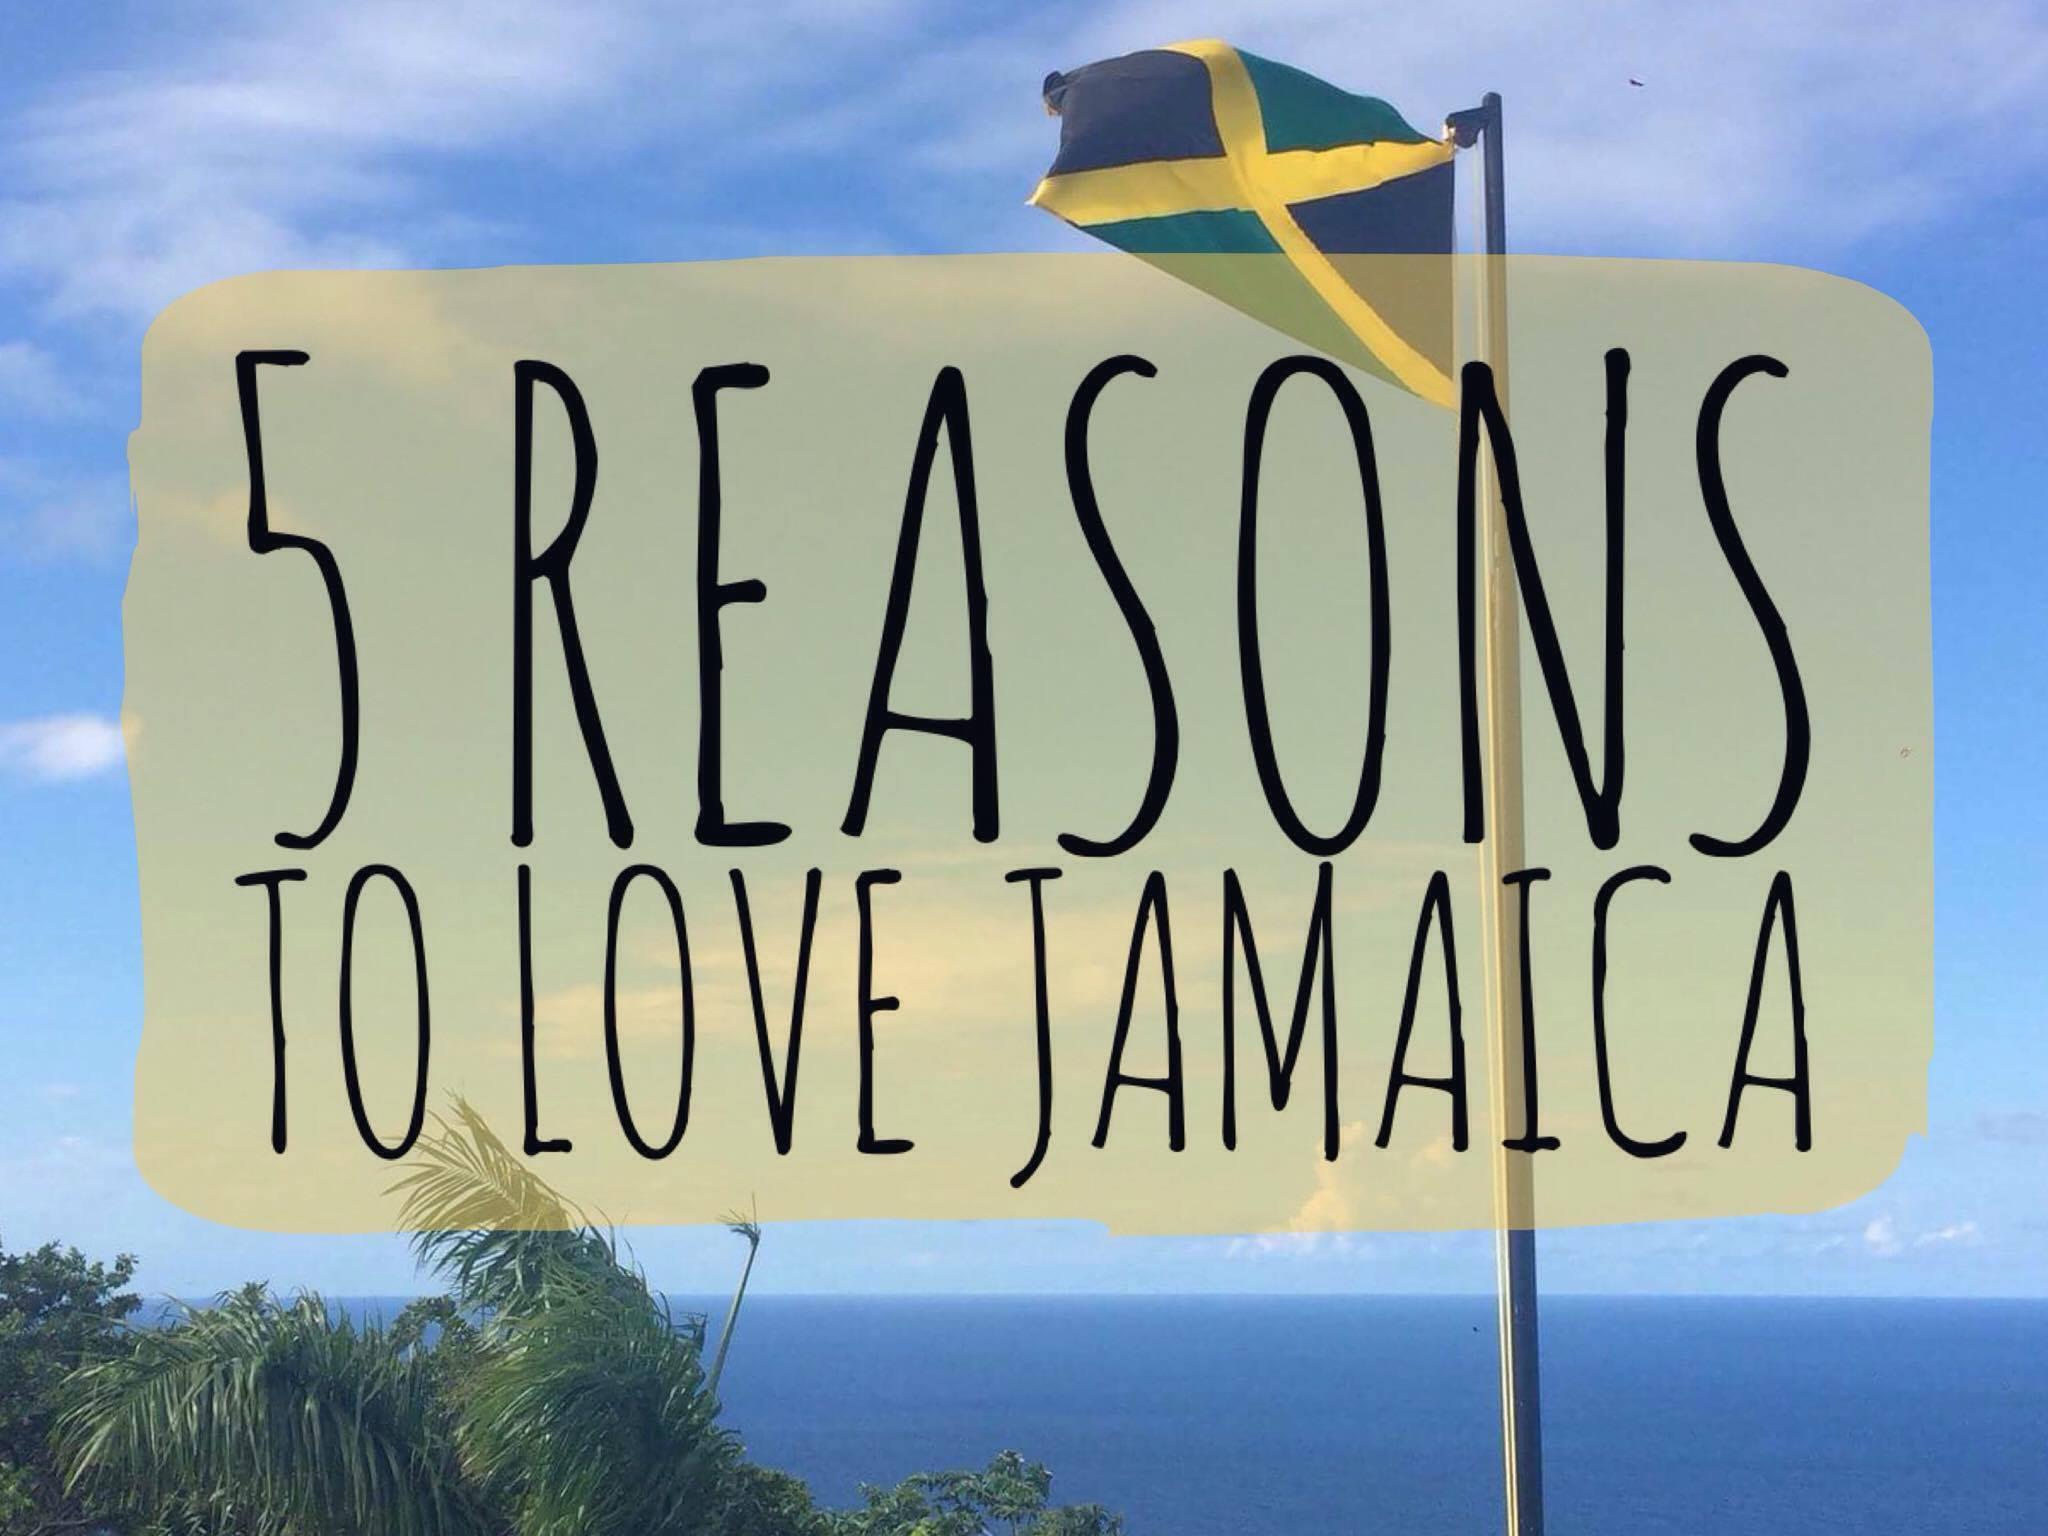 My Wandering Voyage: 5 Reasons to Love Jamaica